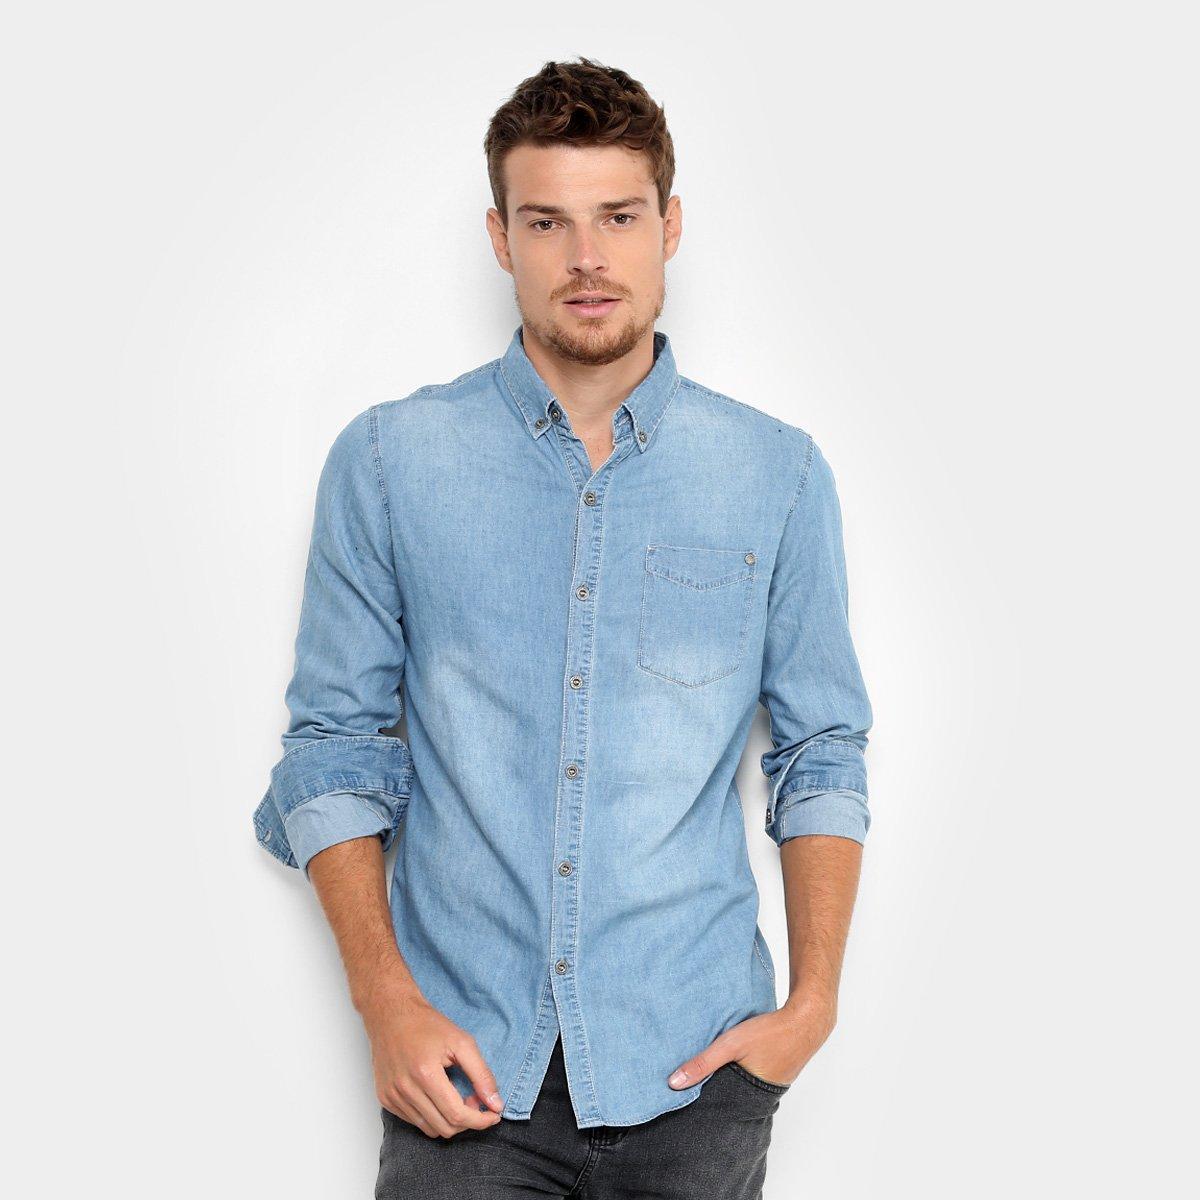 8410036a4f7020 Camisa Jeans Broken Rules com Bolso Masculina | Zattini